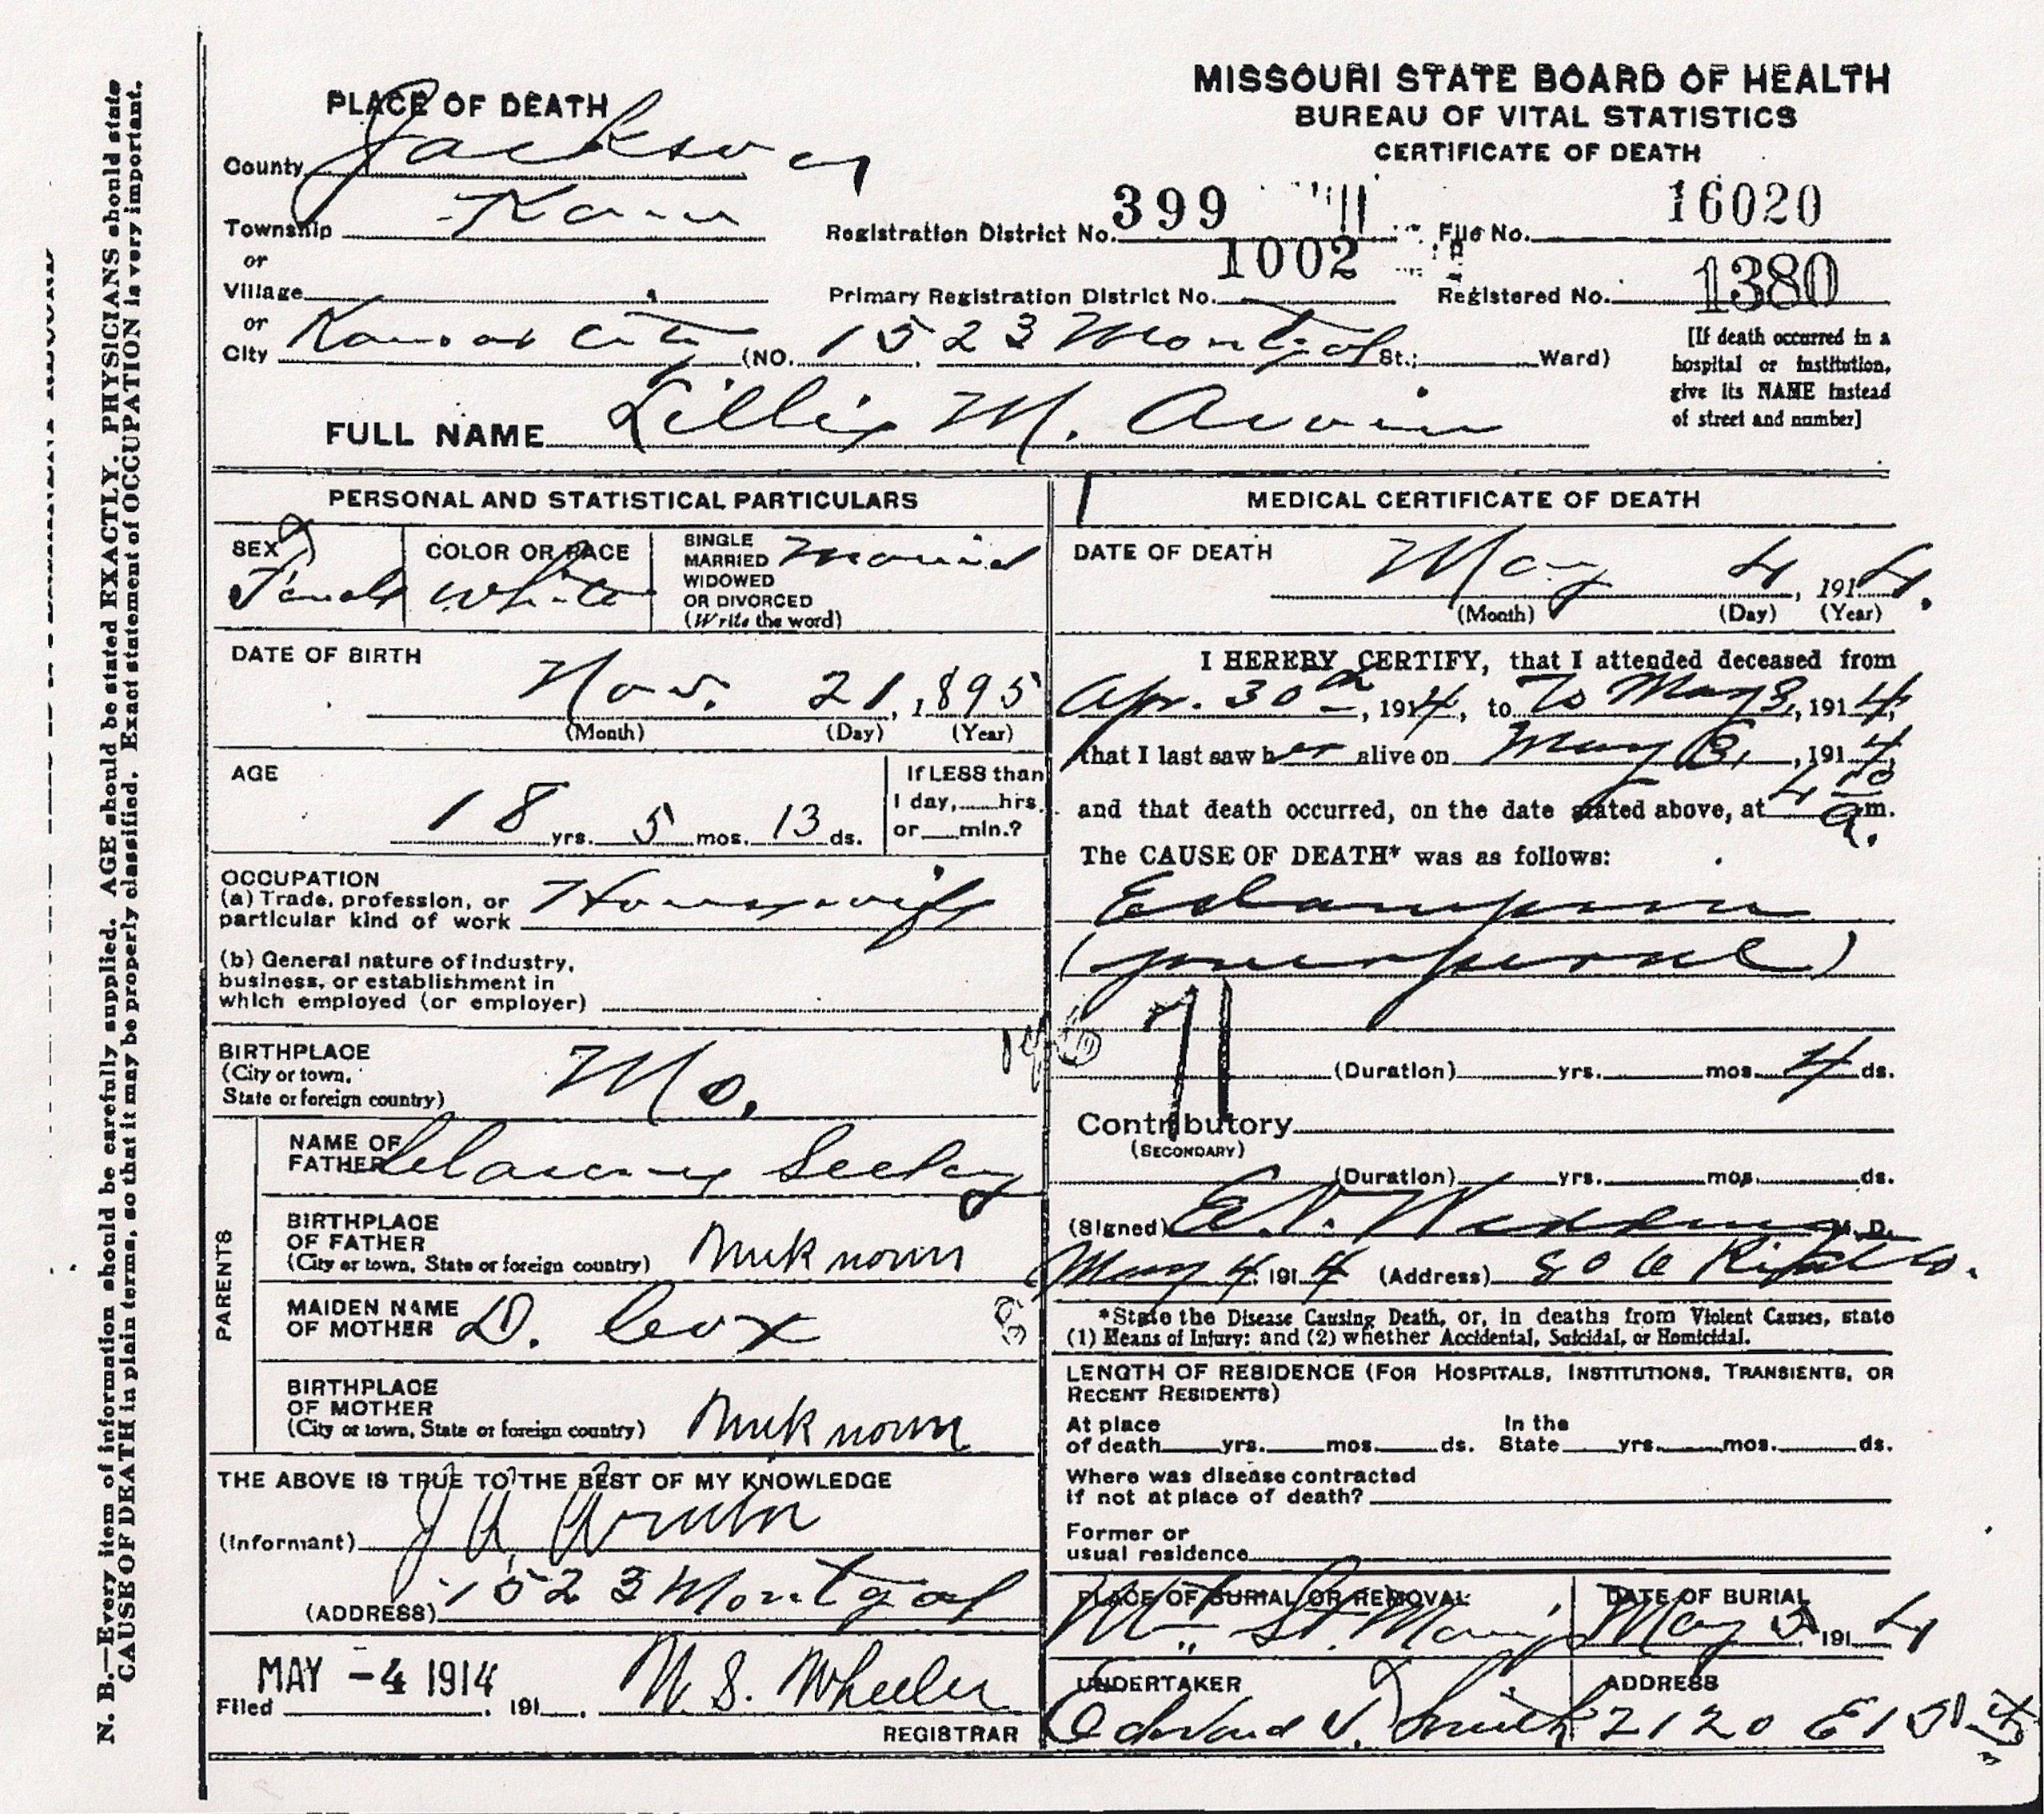 Lillie Arvin Death Certificate Jpg